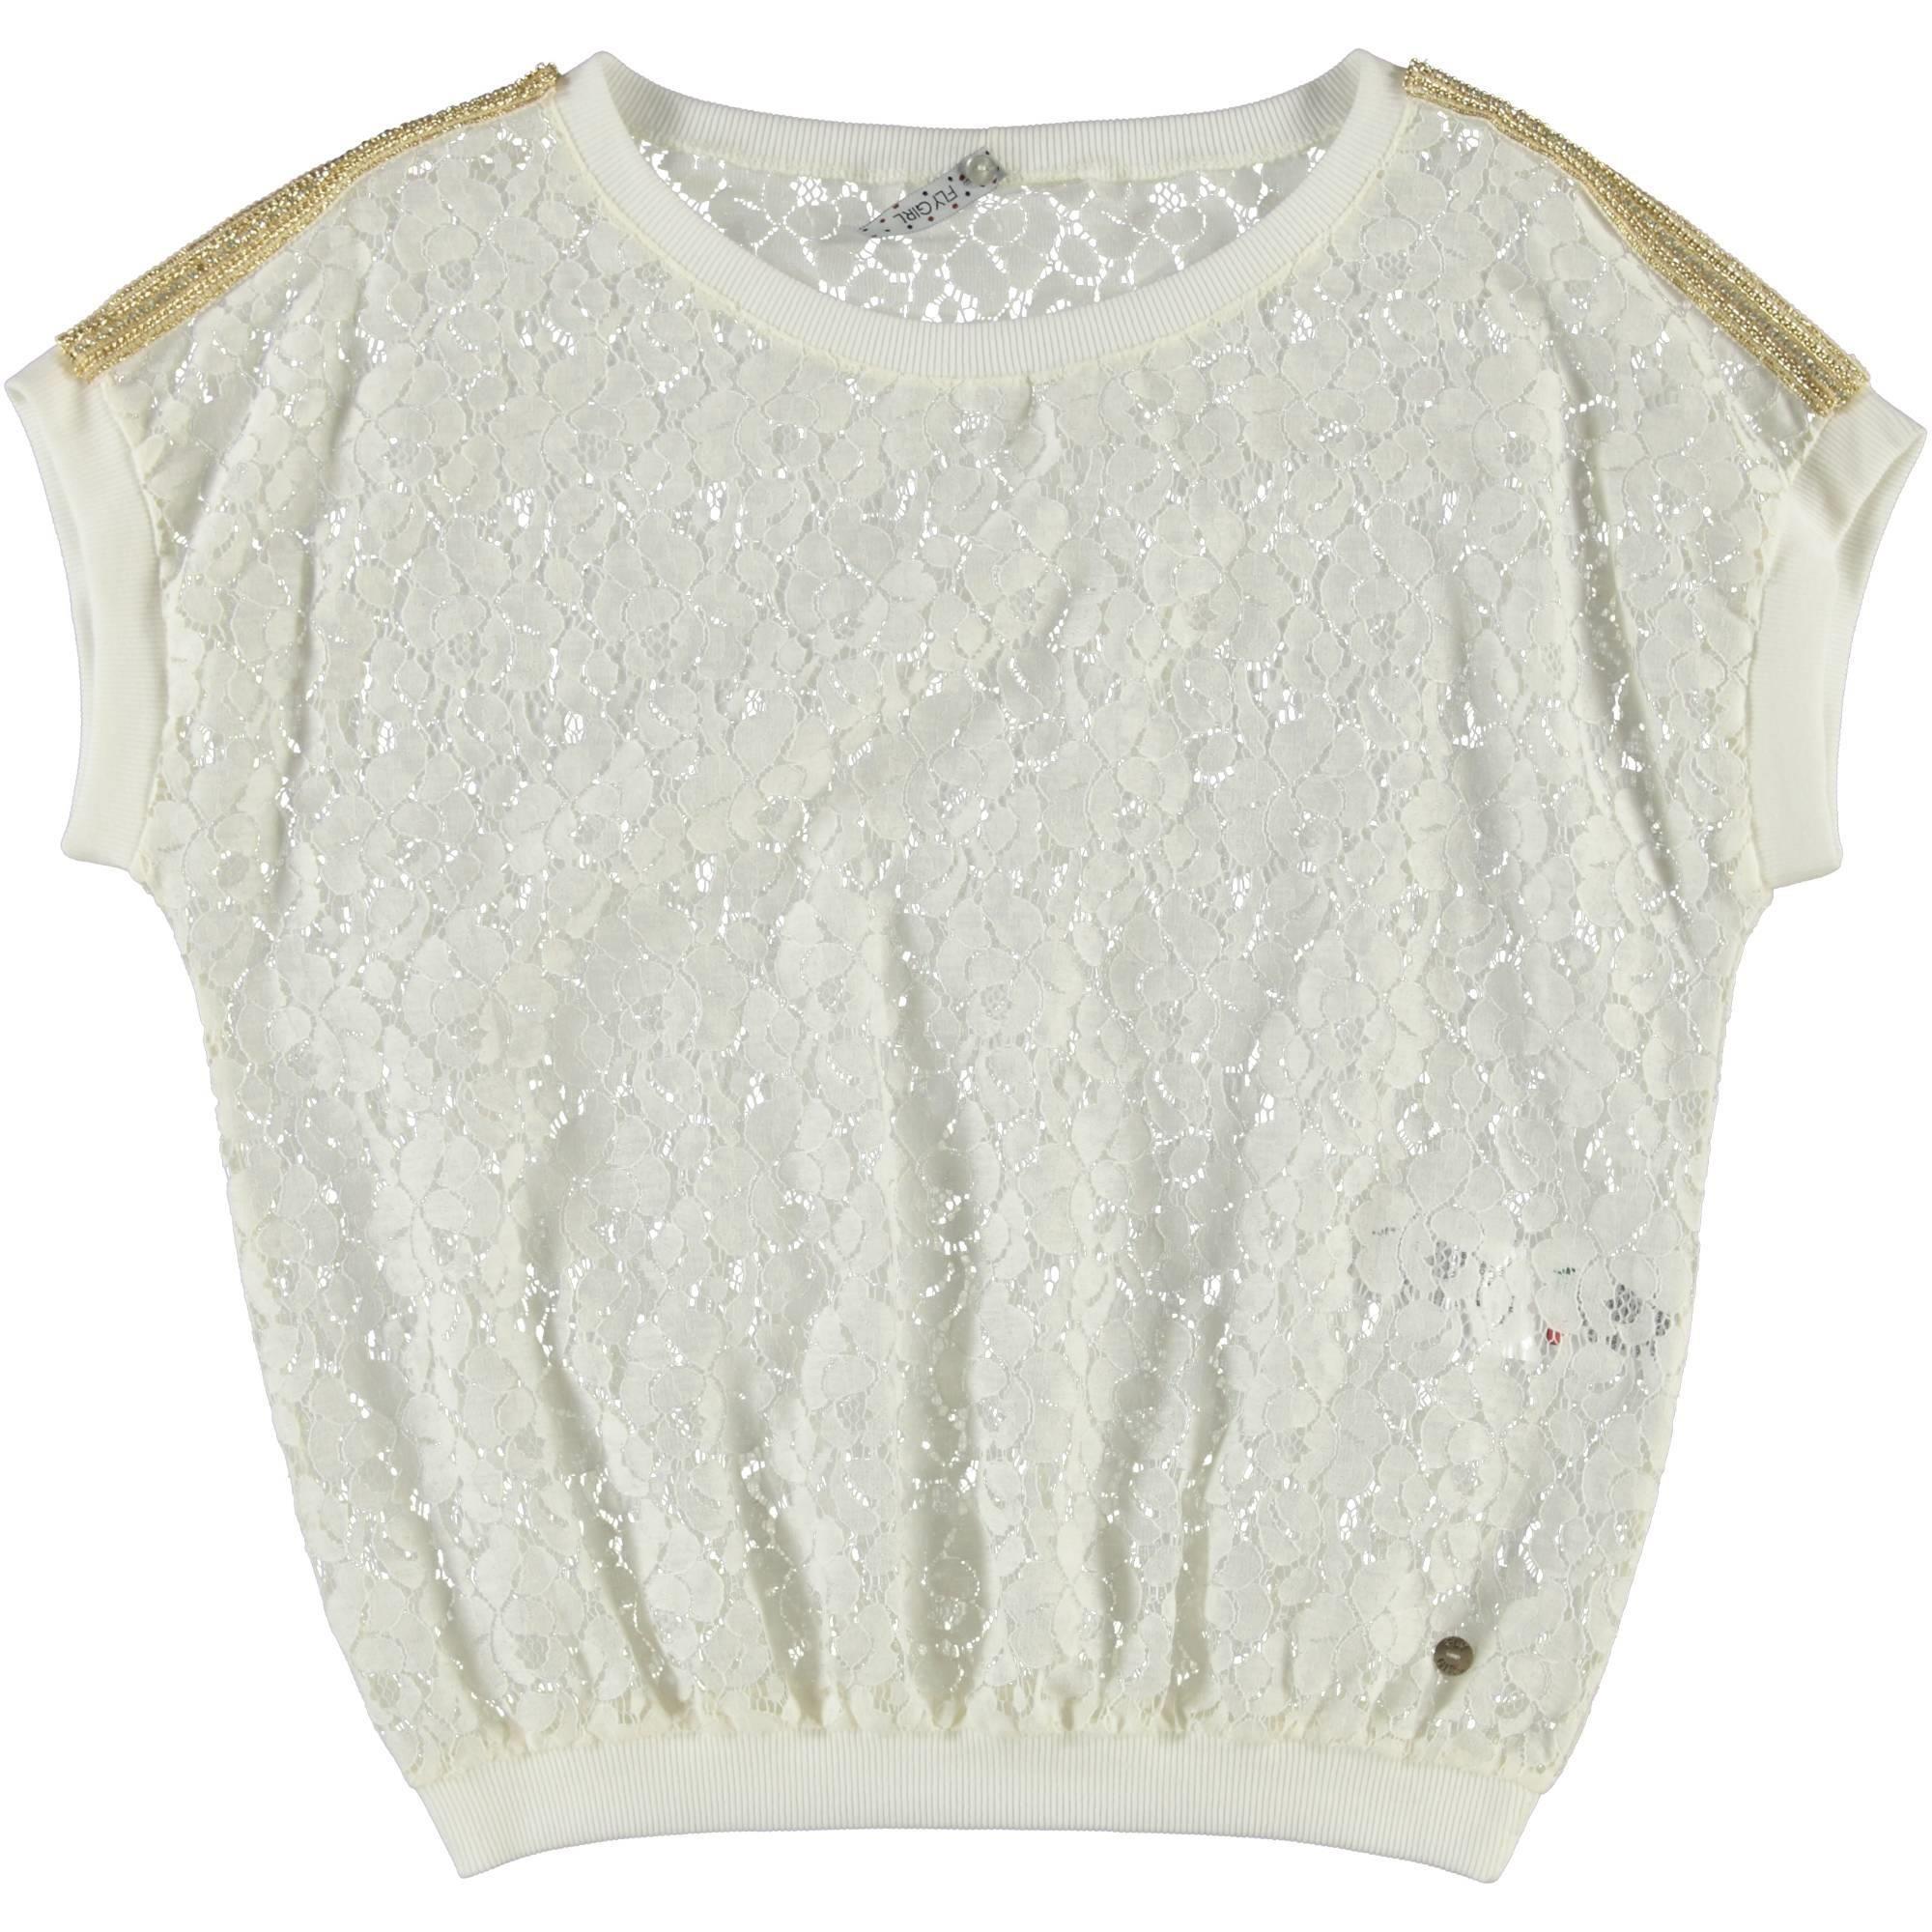 FlyGirl t-shirt in pizzo donna  54,90 scontata del 10% la paghi solo € 49,41 | Nico.it - #nicoit #moda #fashion #fashionista #springsummer #ss15 #spring #summer #newarrivals #newcollection #fashion #love #bestoftheday #lookoftheday #outfitoftheday #picoftheday #lace #tshirt #flygirl